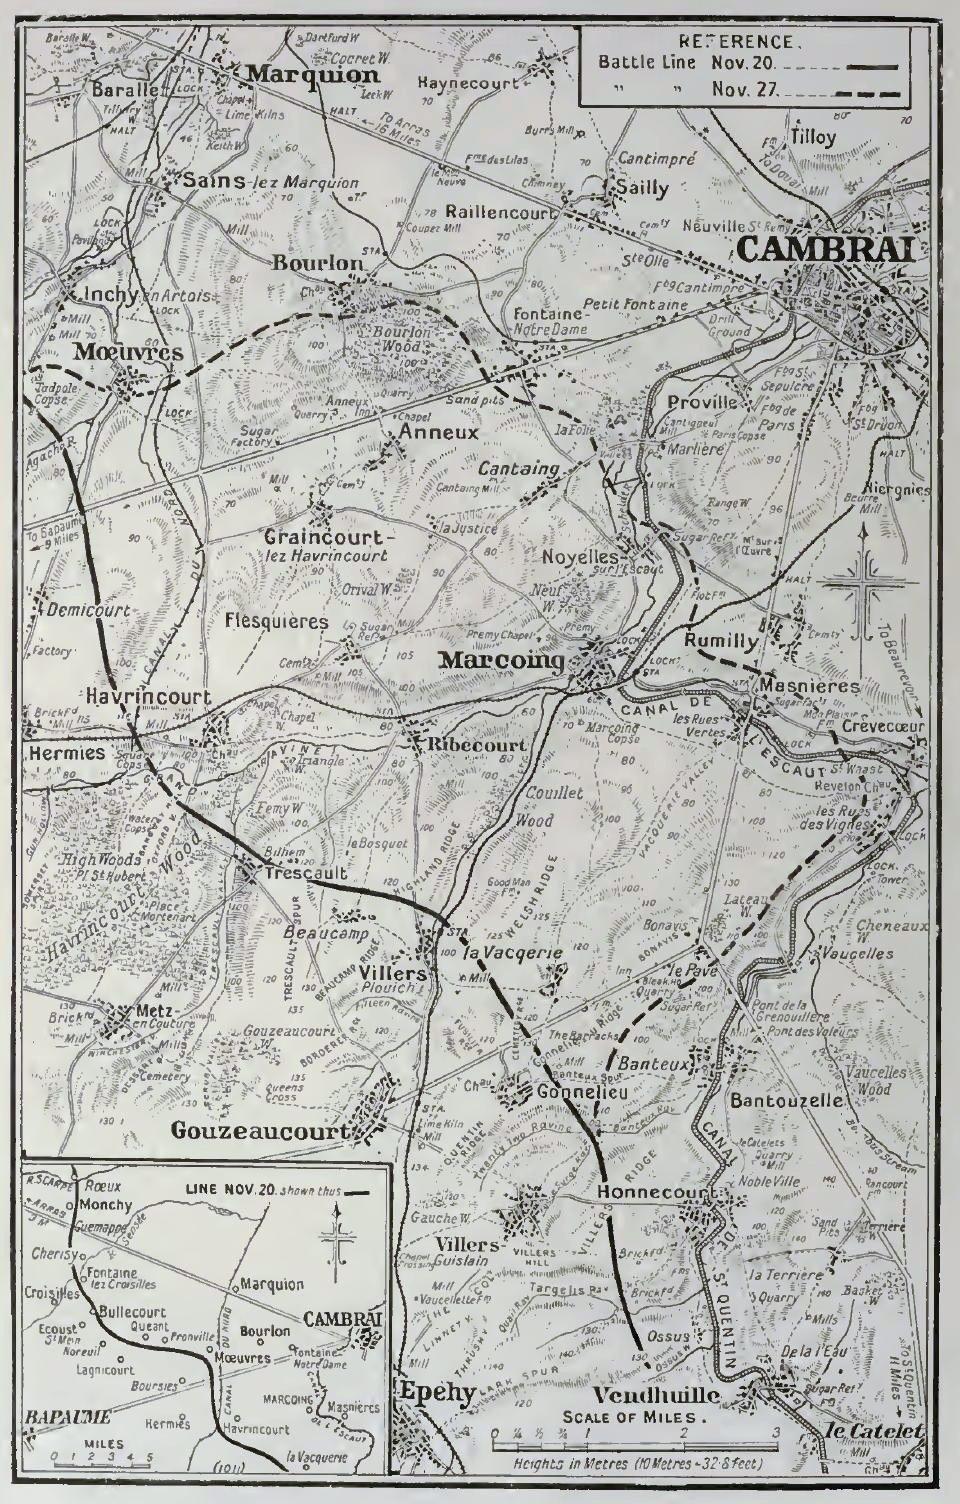 Cambrai area 1917